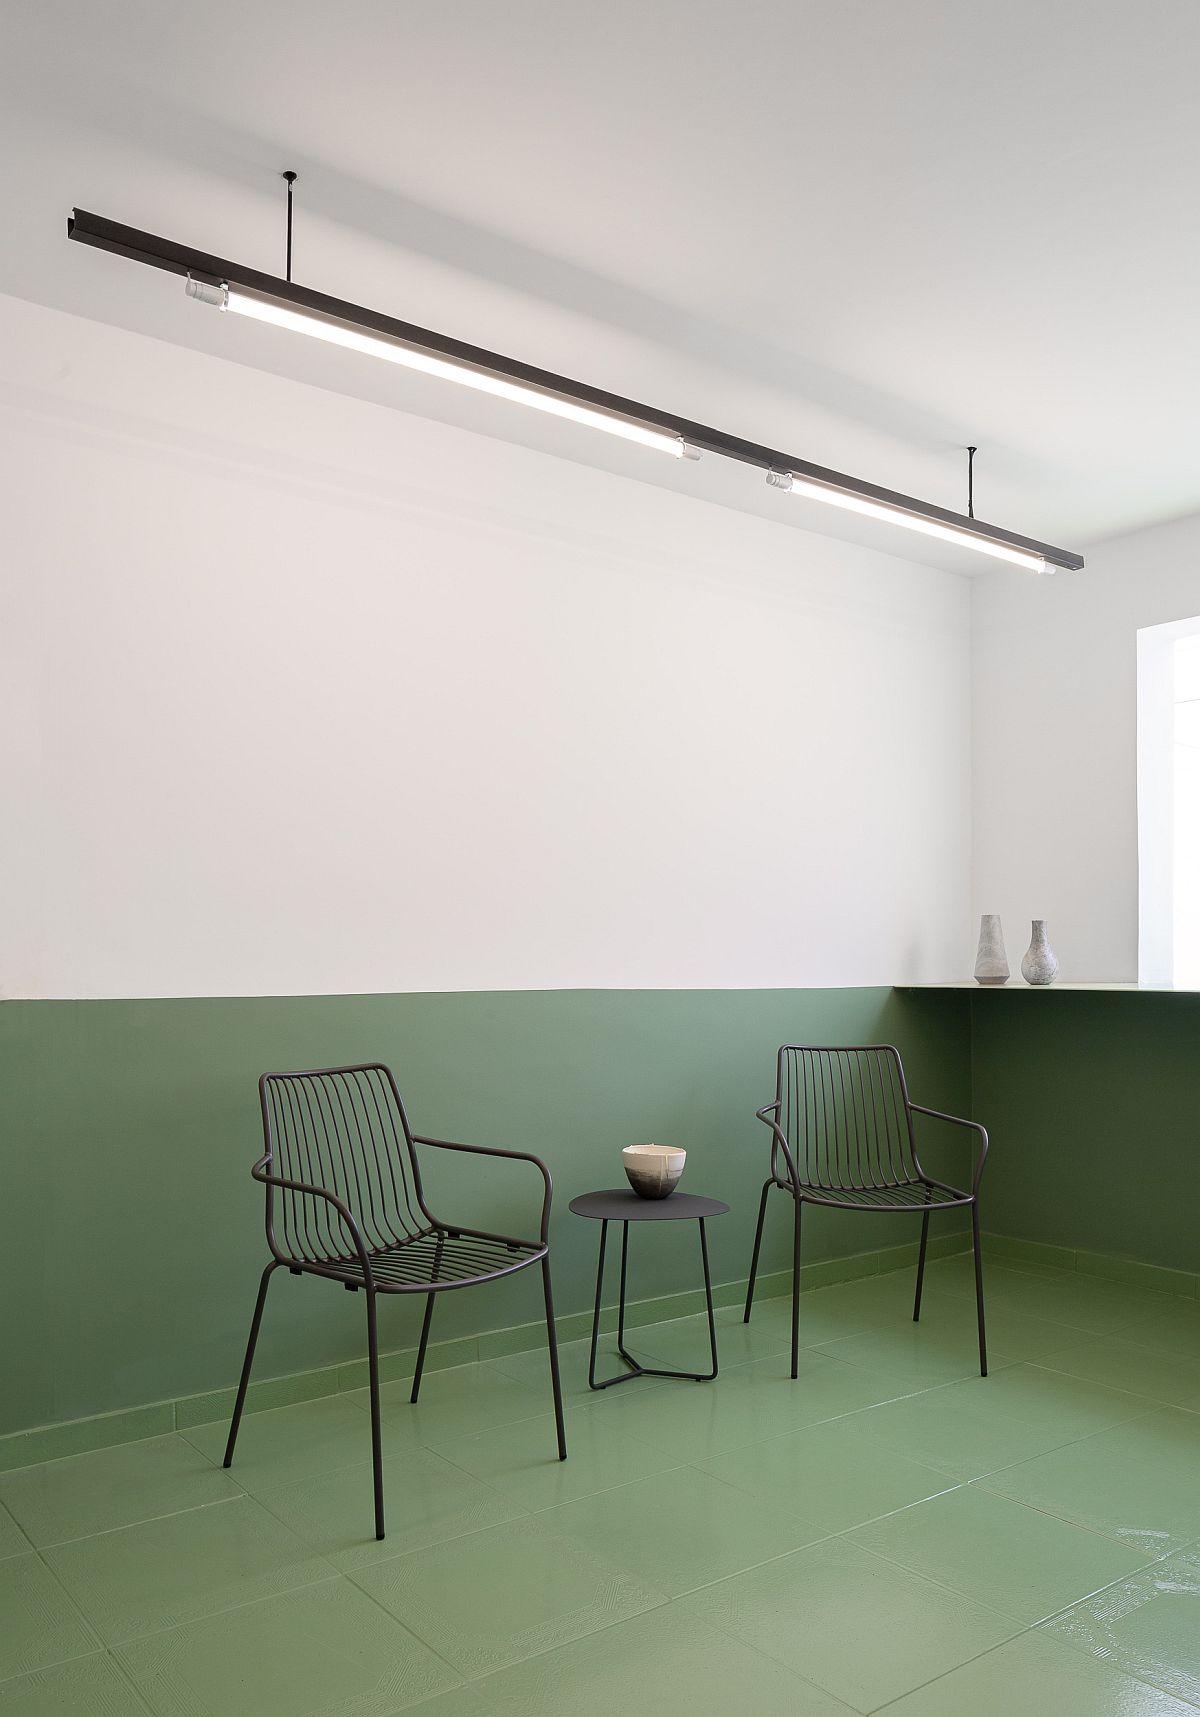 Slim-and-stylish-lighting-inside-the-modern-minimal-restaurant-63787